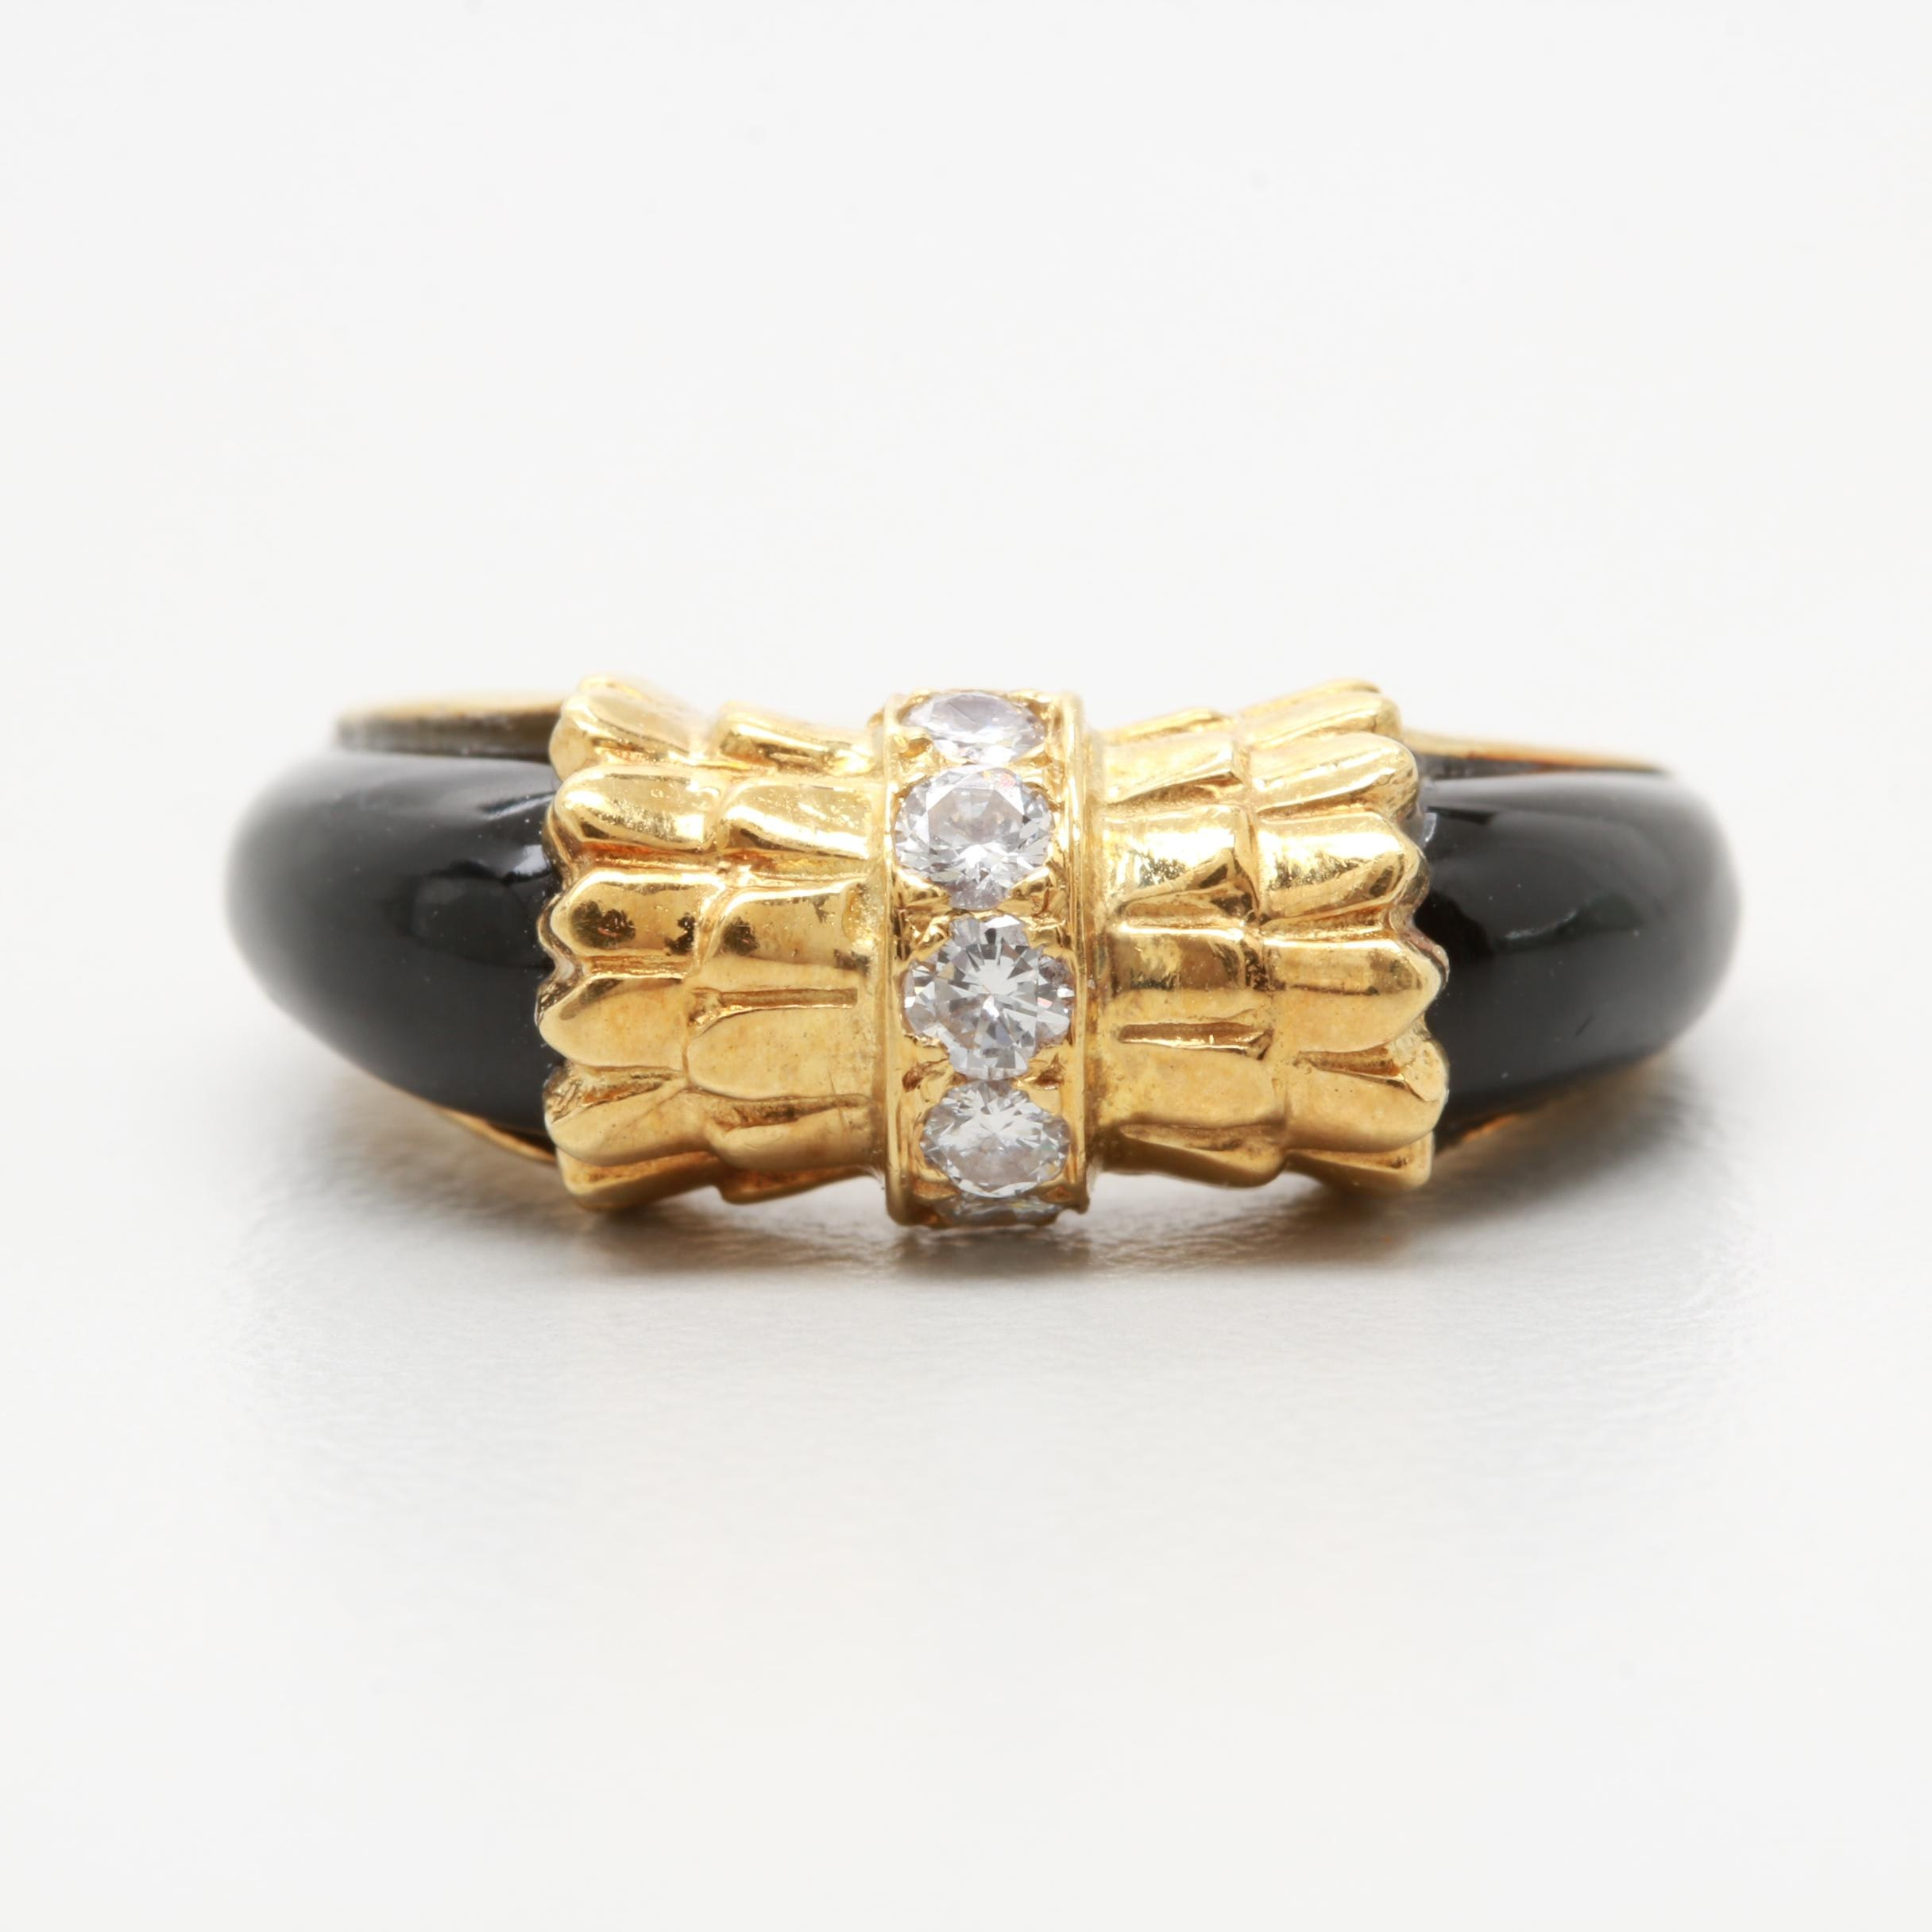 18K Yellow Gold Onyx and Diamond Ring